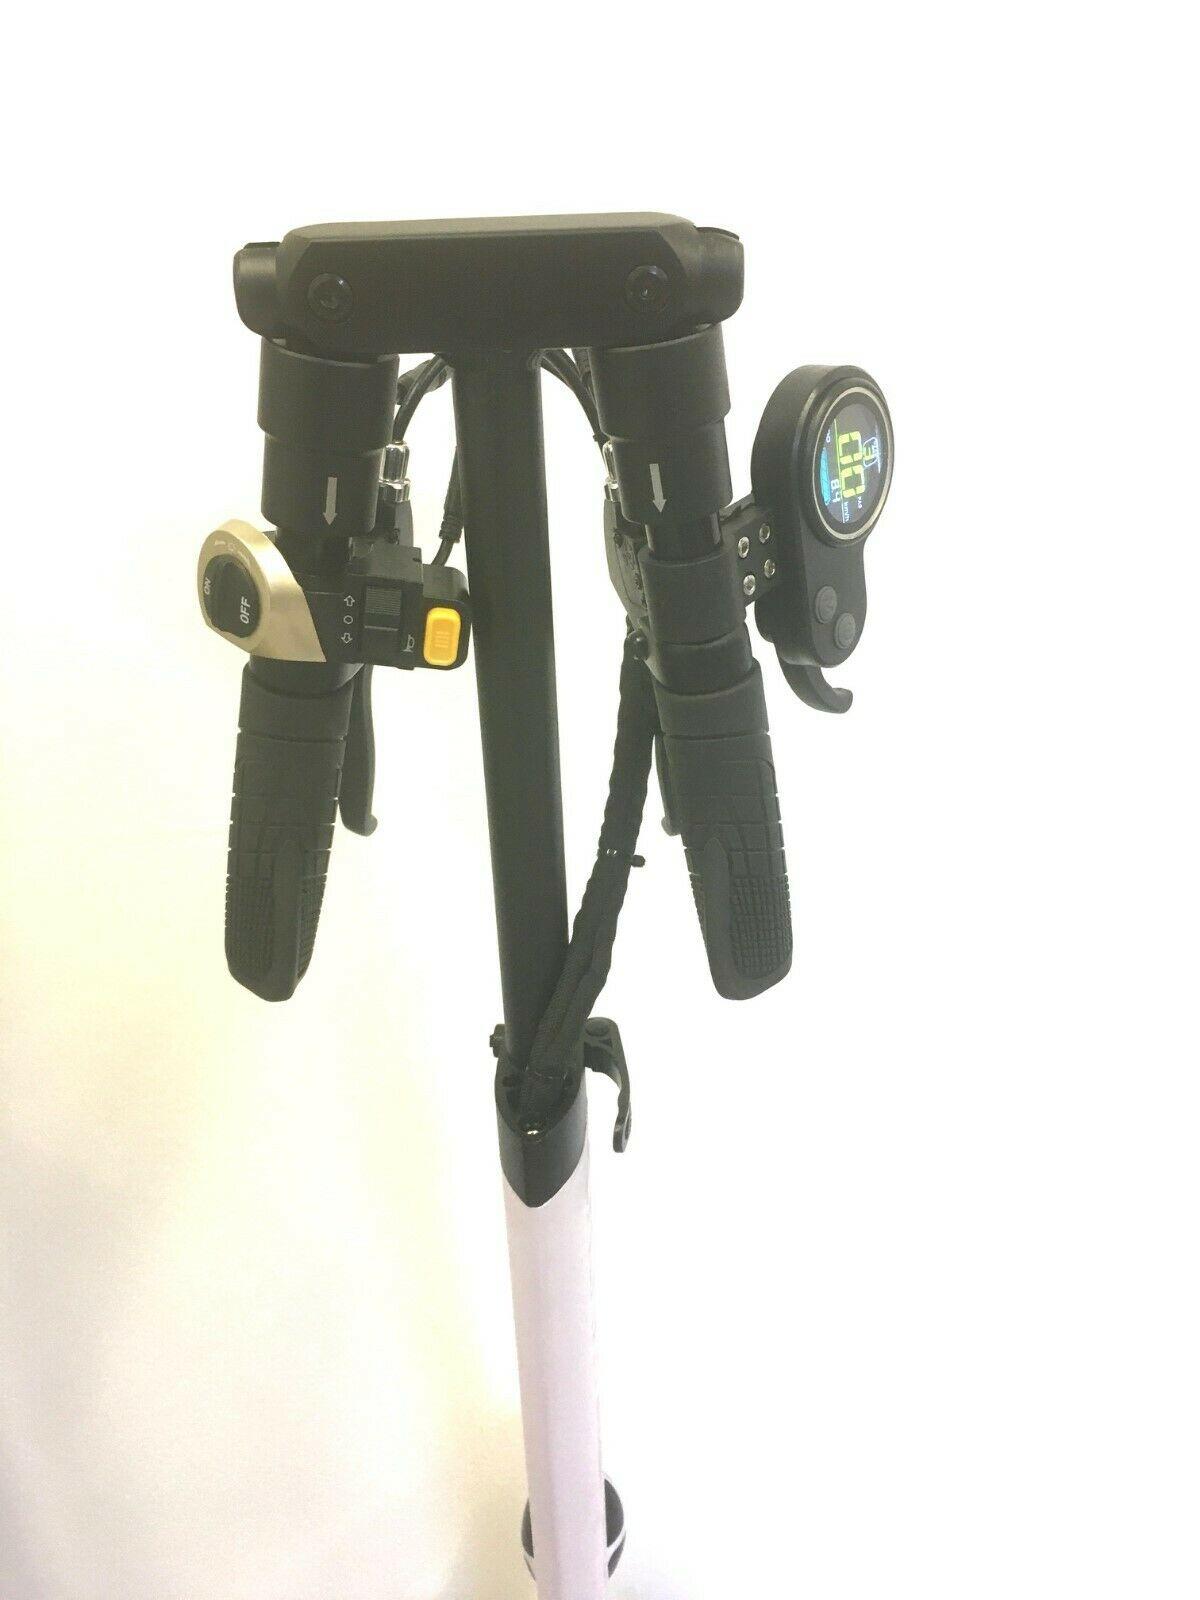 GALAXY URBAN X3 Electric Scooter 500W